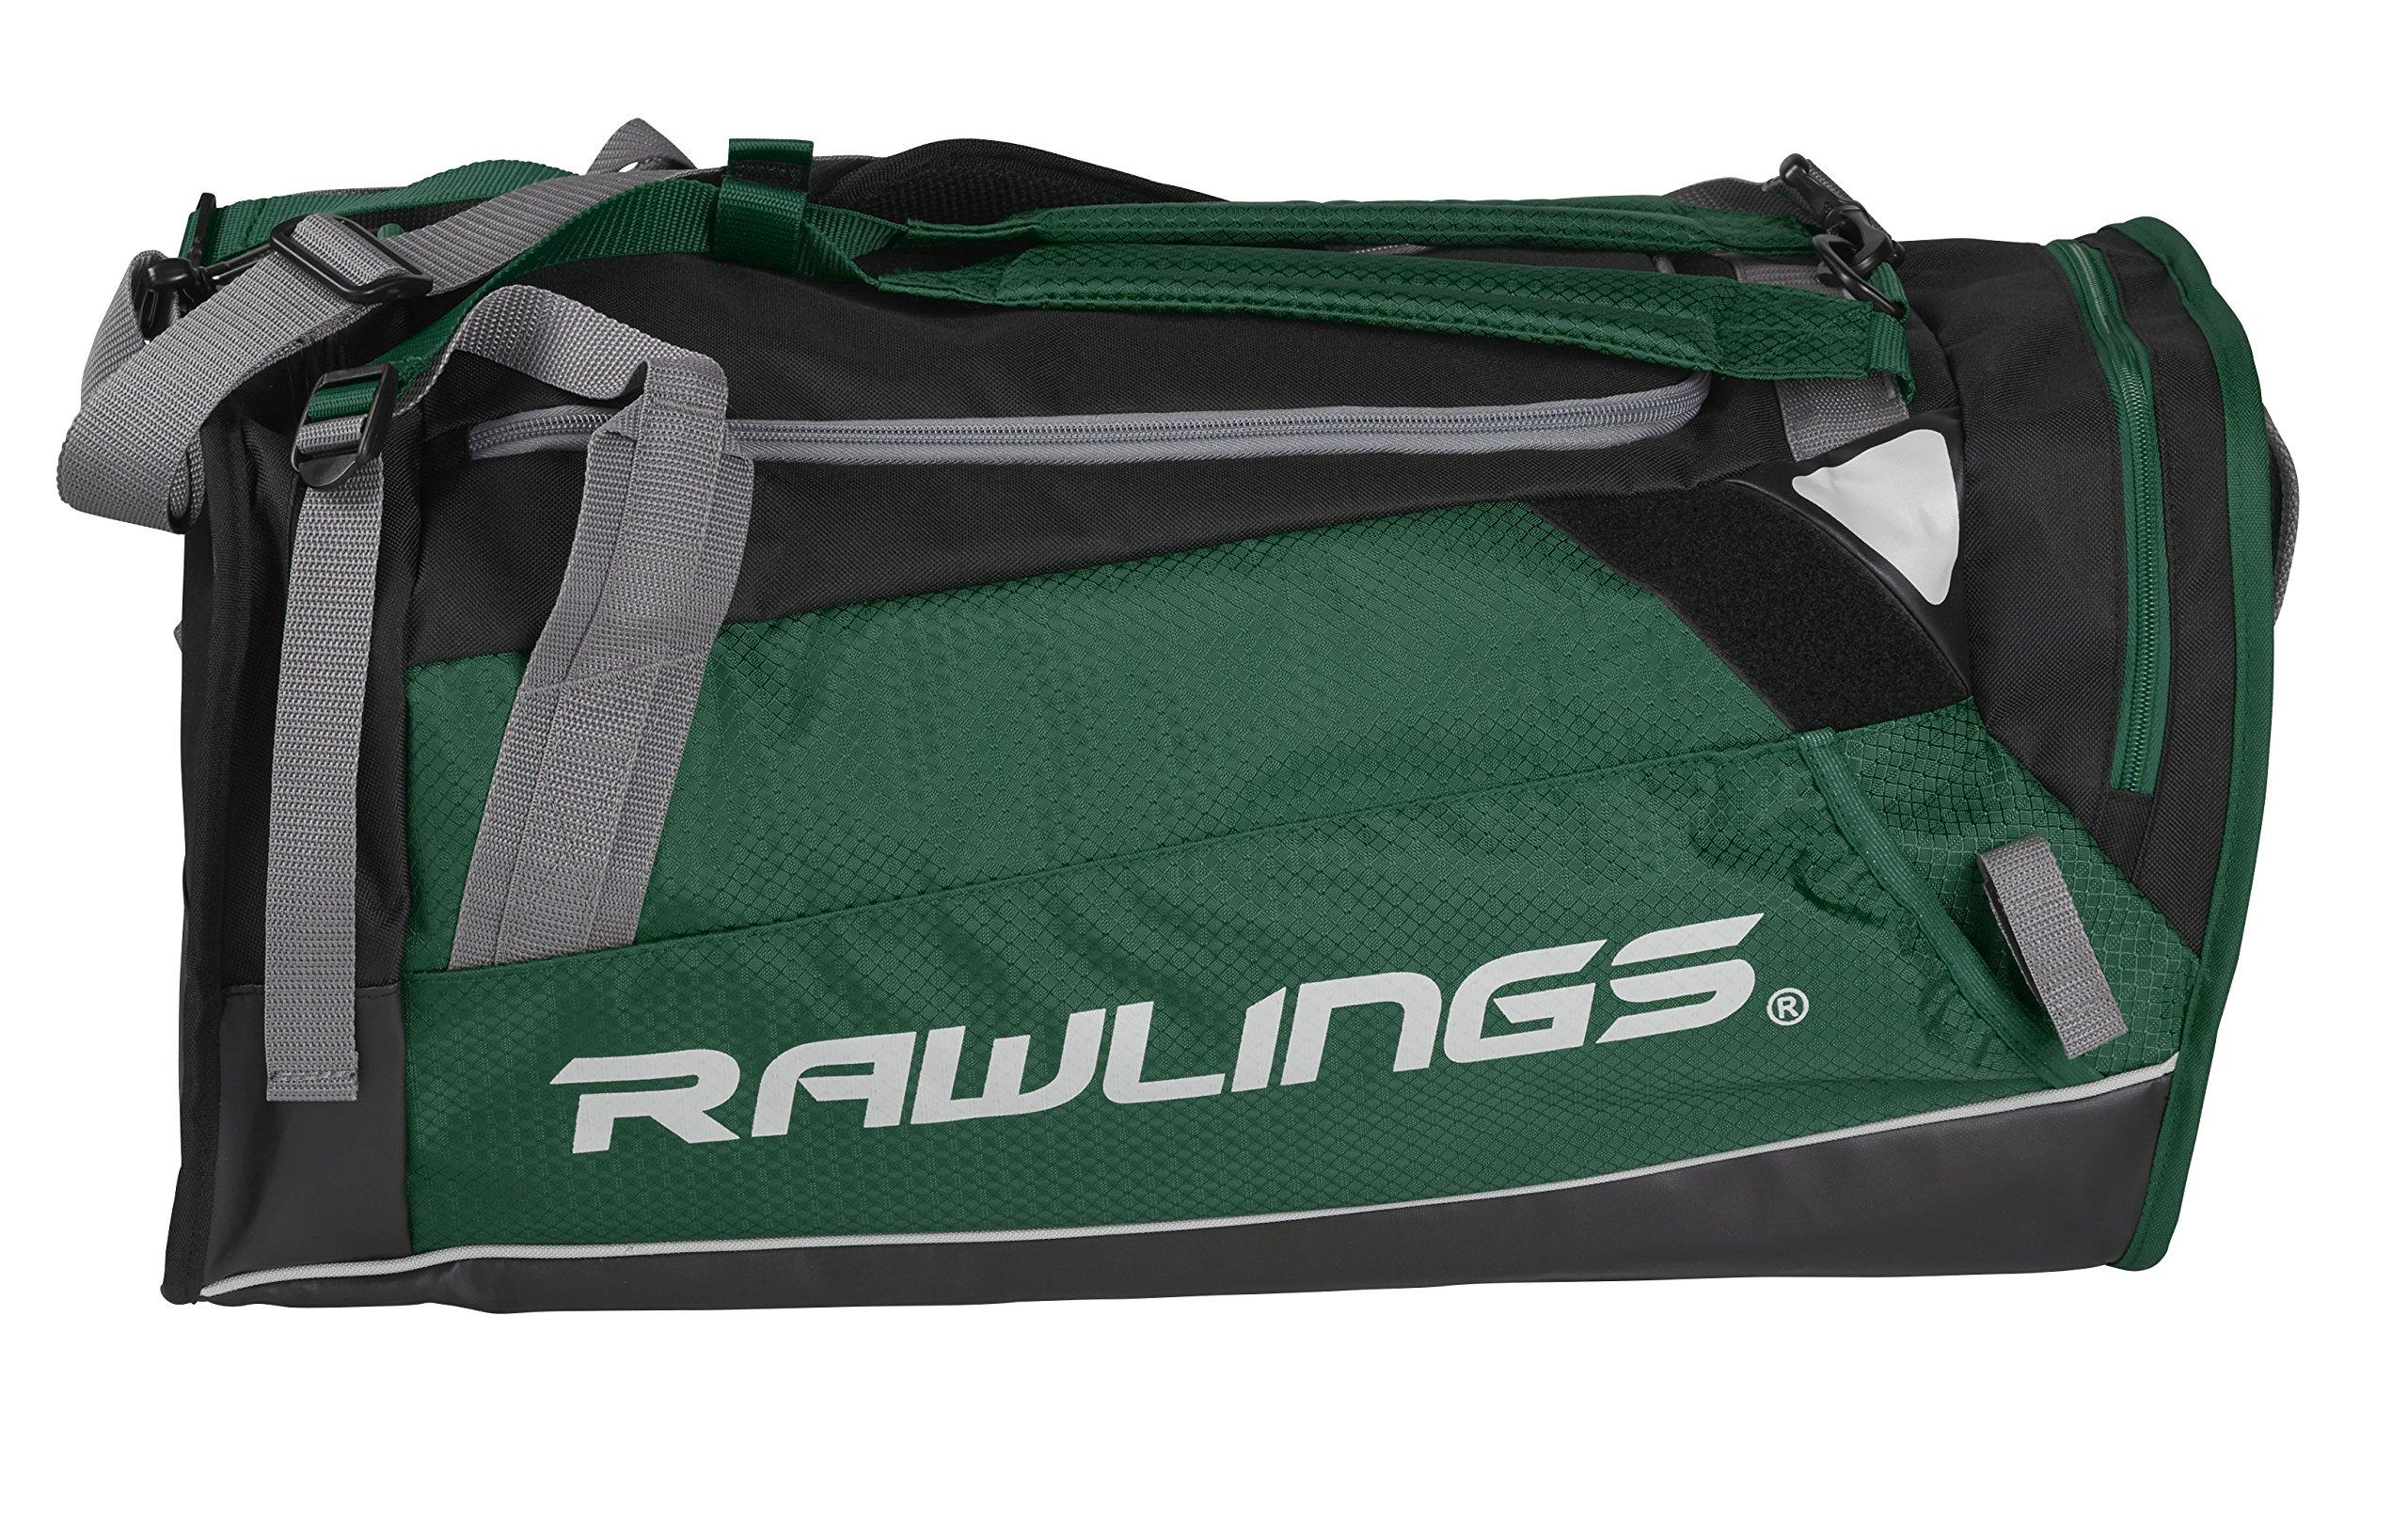 Rawlings Hybrid Duffel/Backpack Baseball/Softball Bag, Green by RAWLINGS